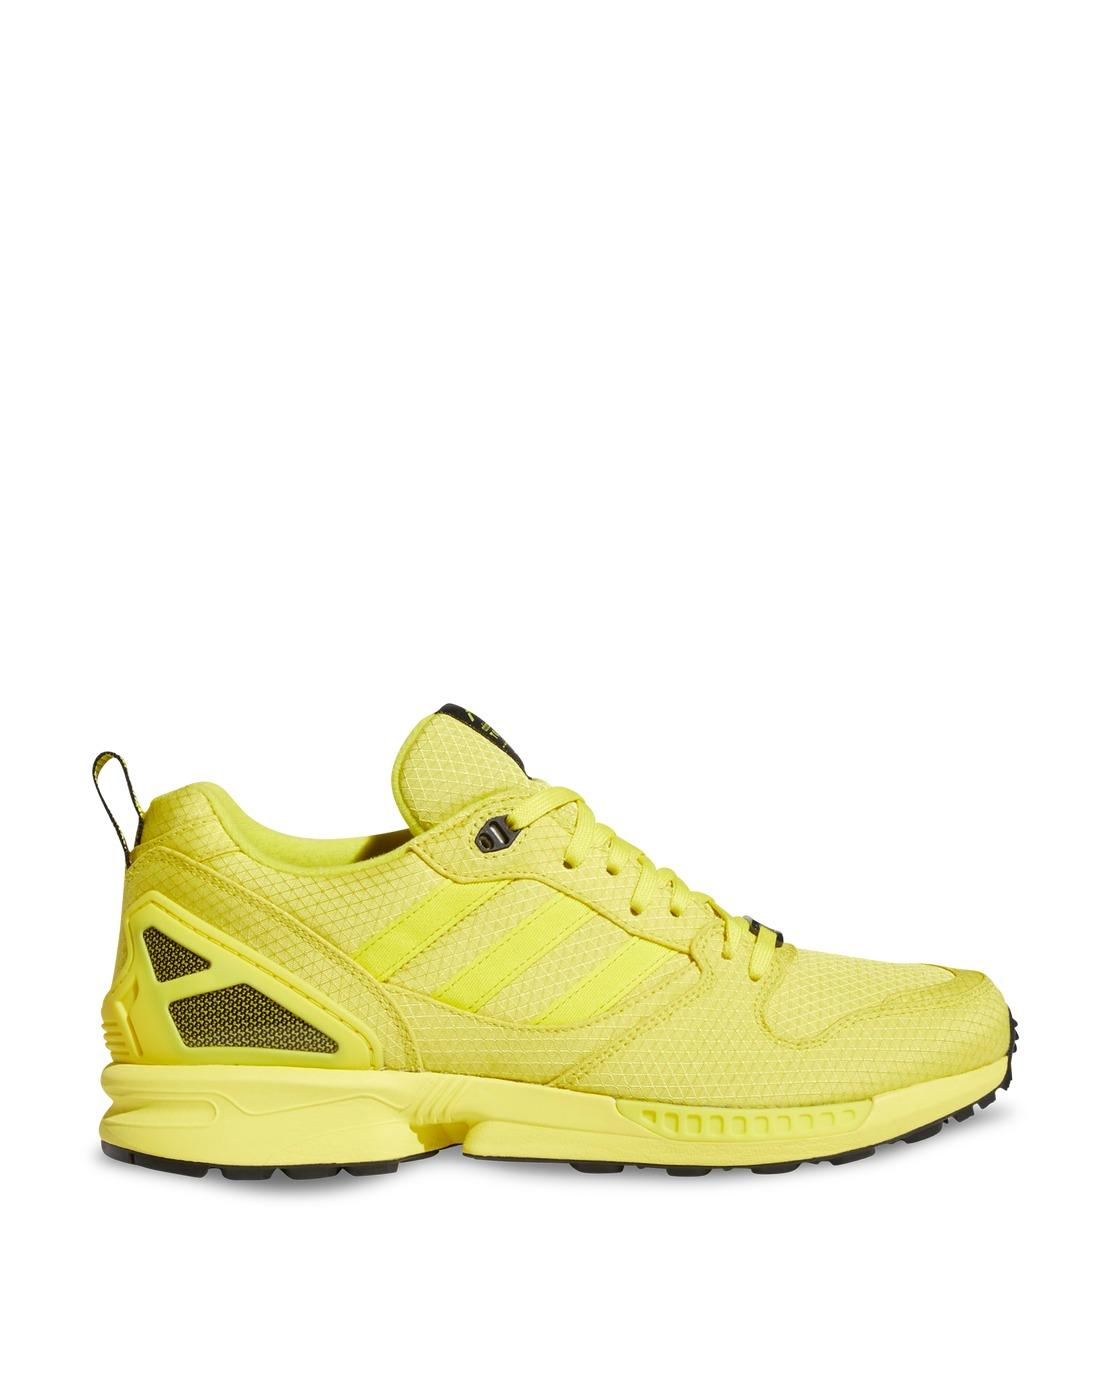 Adidas Originals Azx: T   Torsion Zx5000 Sneakers Bright Yellow/Cyan